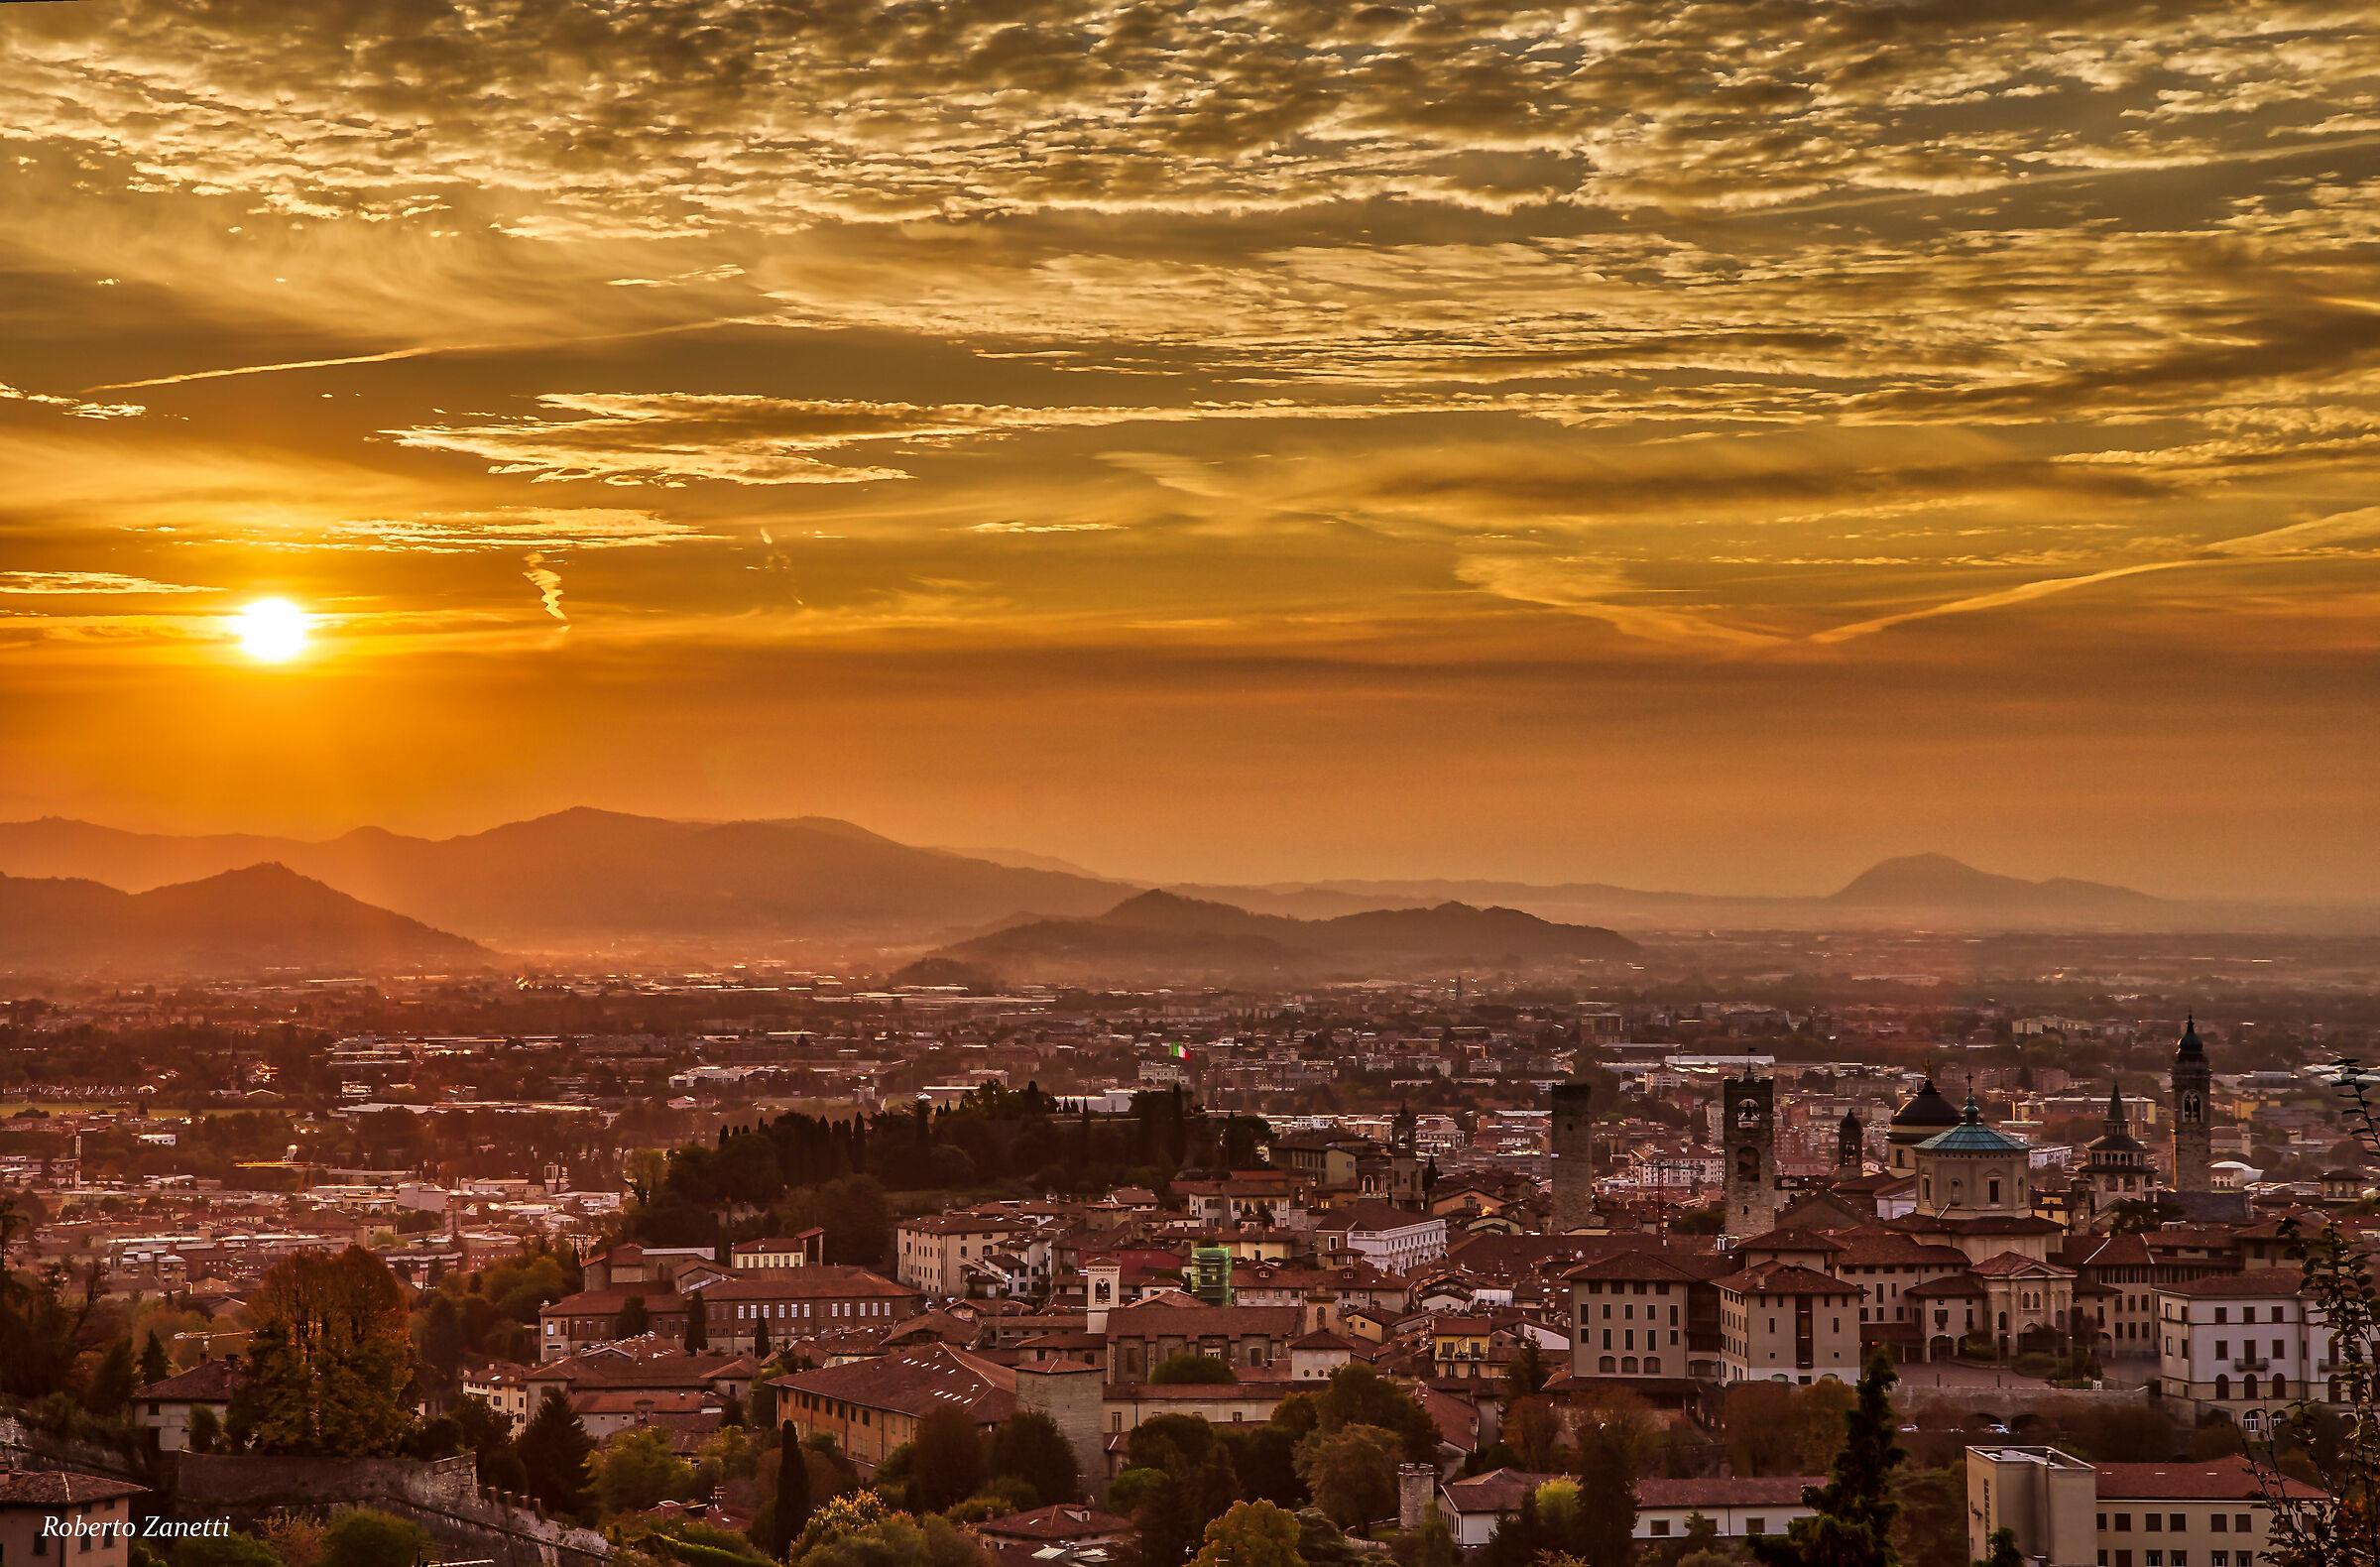 A new dawn for Bergamo High City...